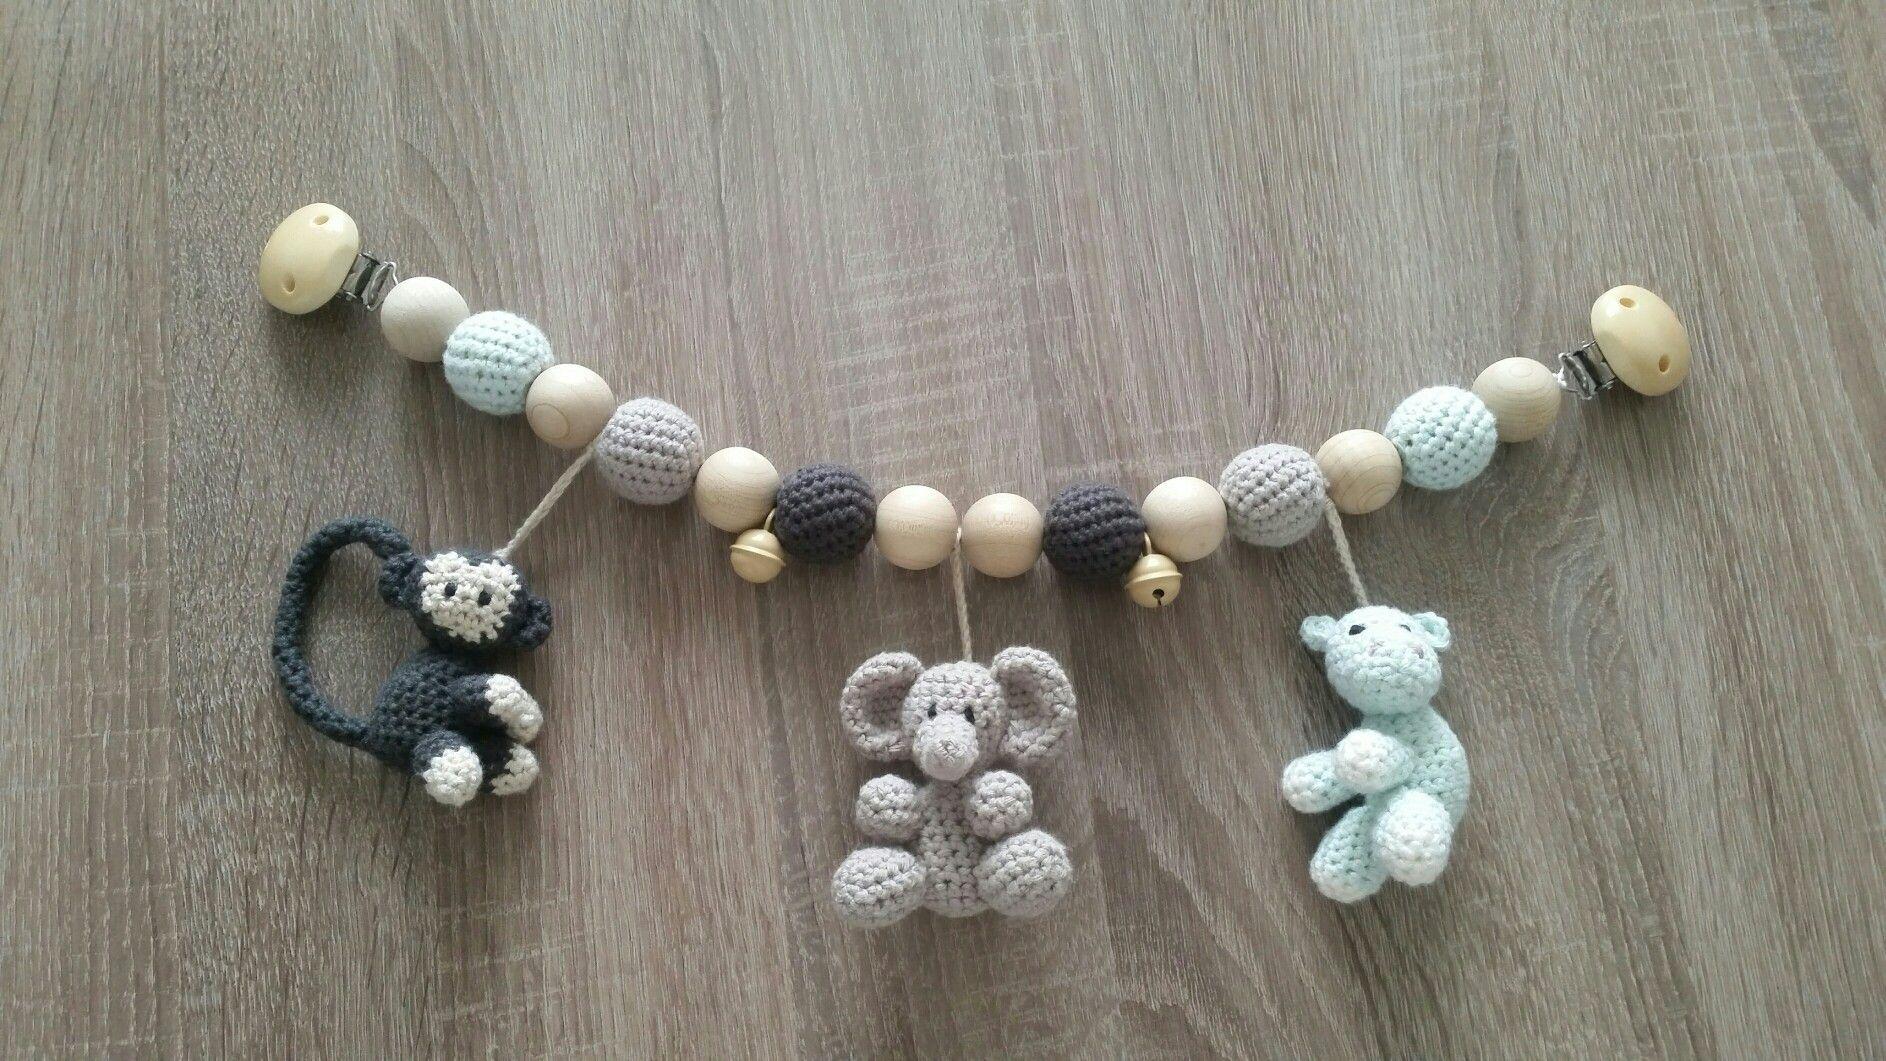 Kinderwagenkette Häkeln Häkeln Crochet Crochet Baby Und Crochet